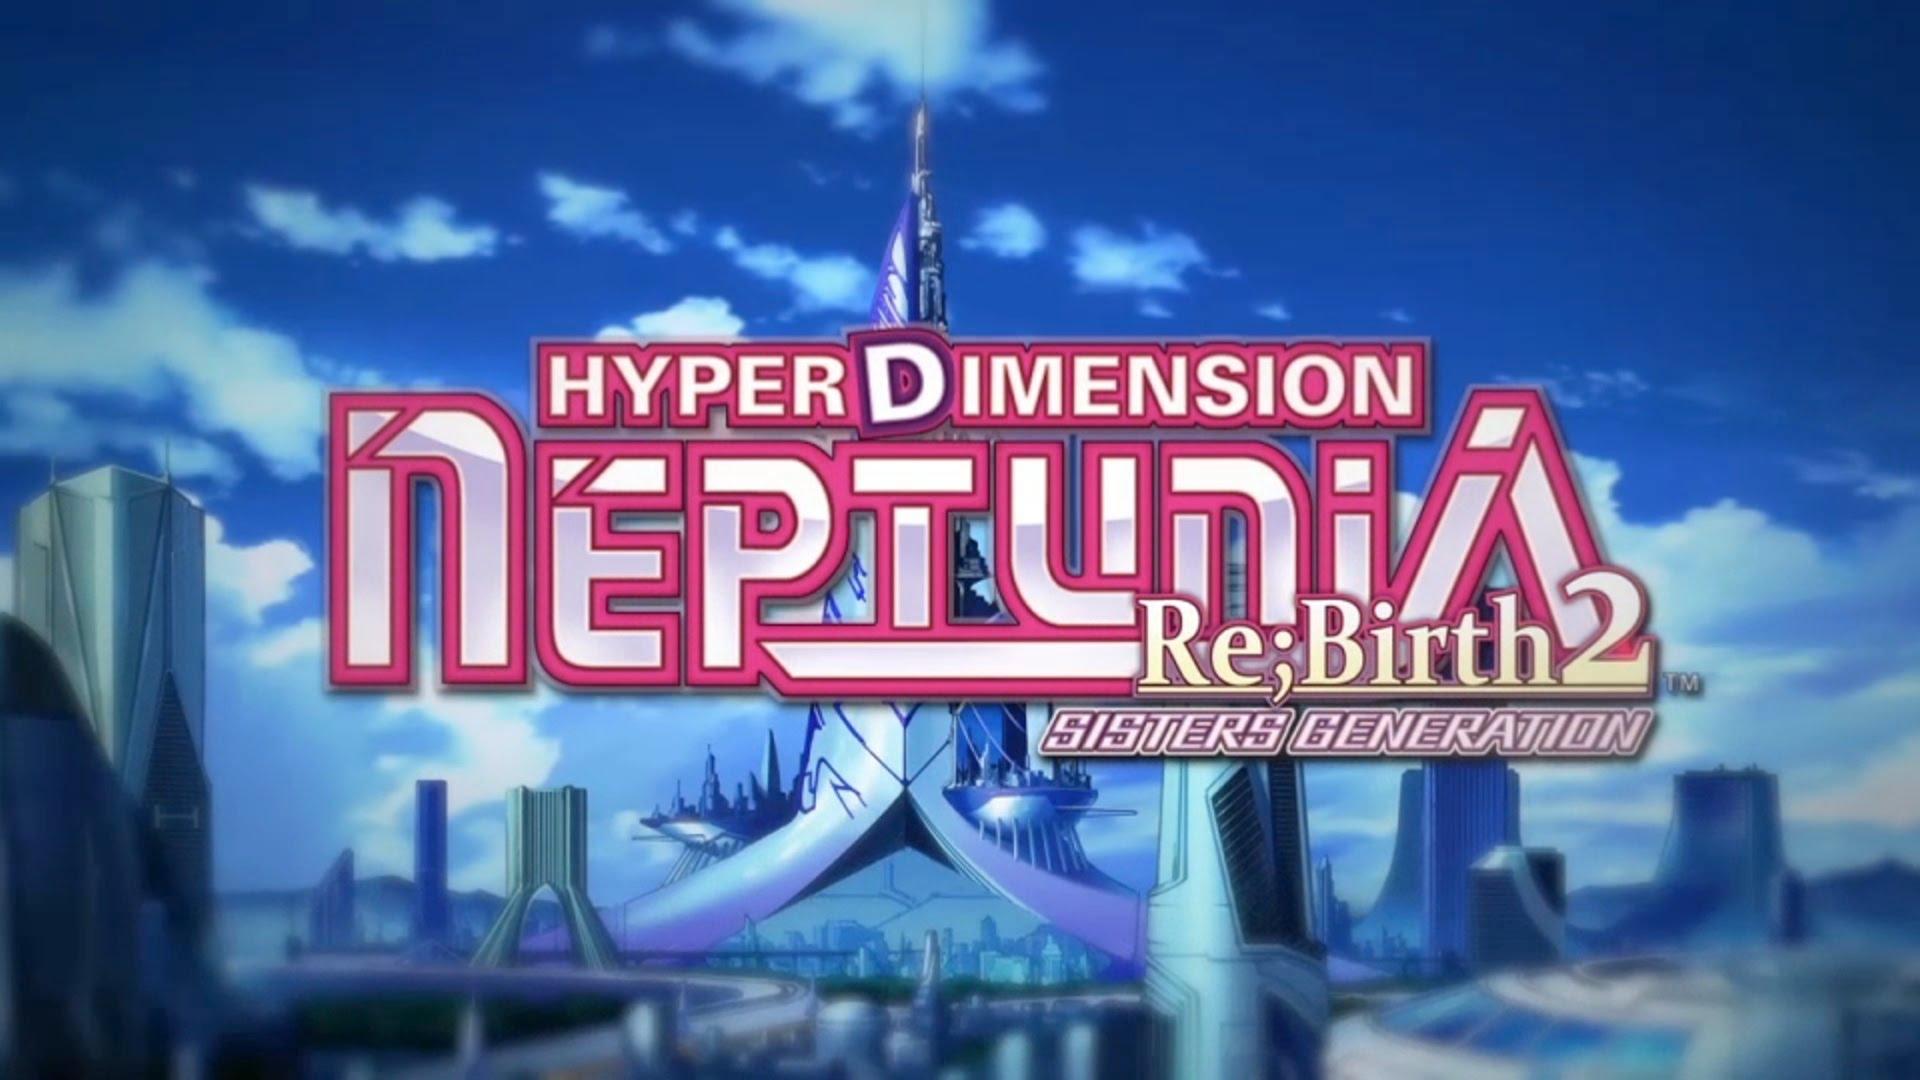 Nice wallpapers Hyperdimension Neptunia Re;Birth2 Sisters Generation 1920x1080px